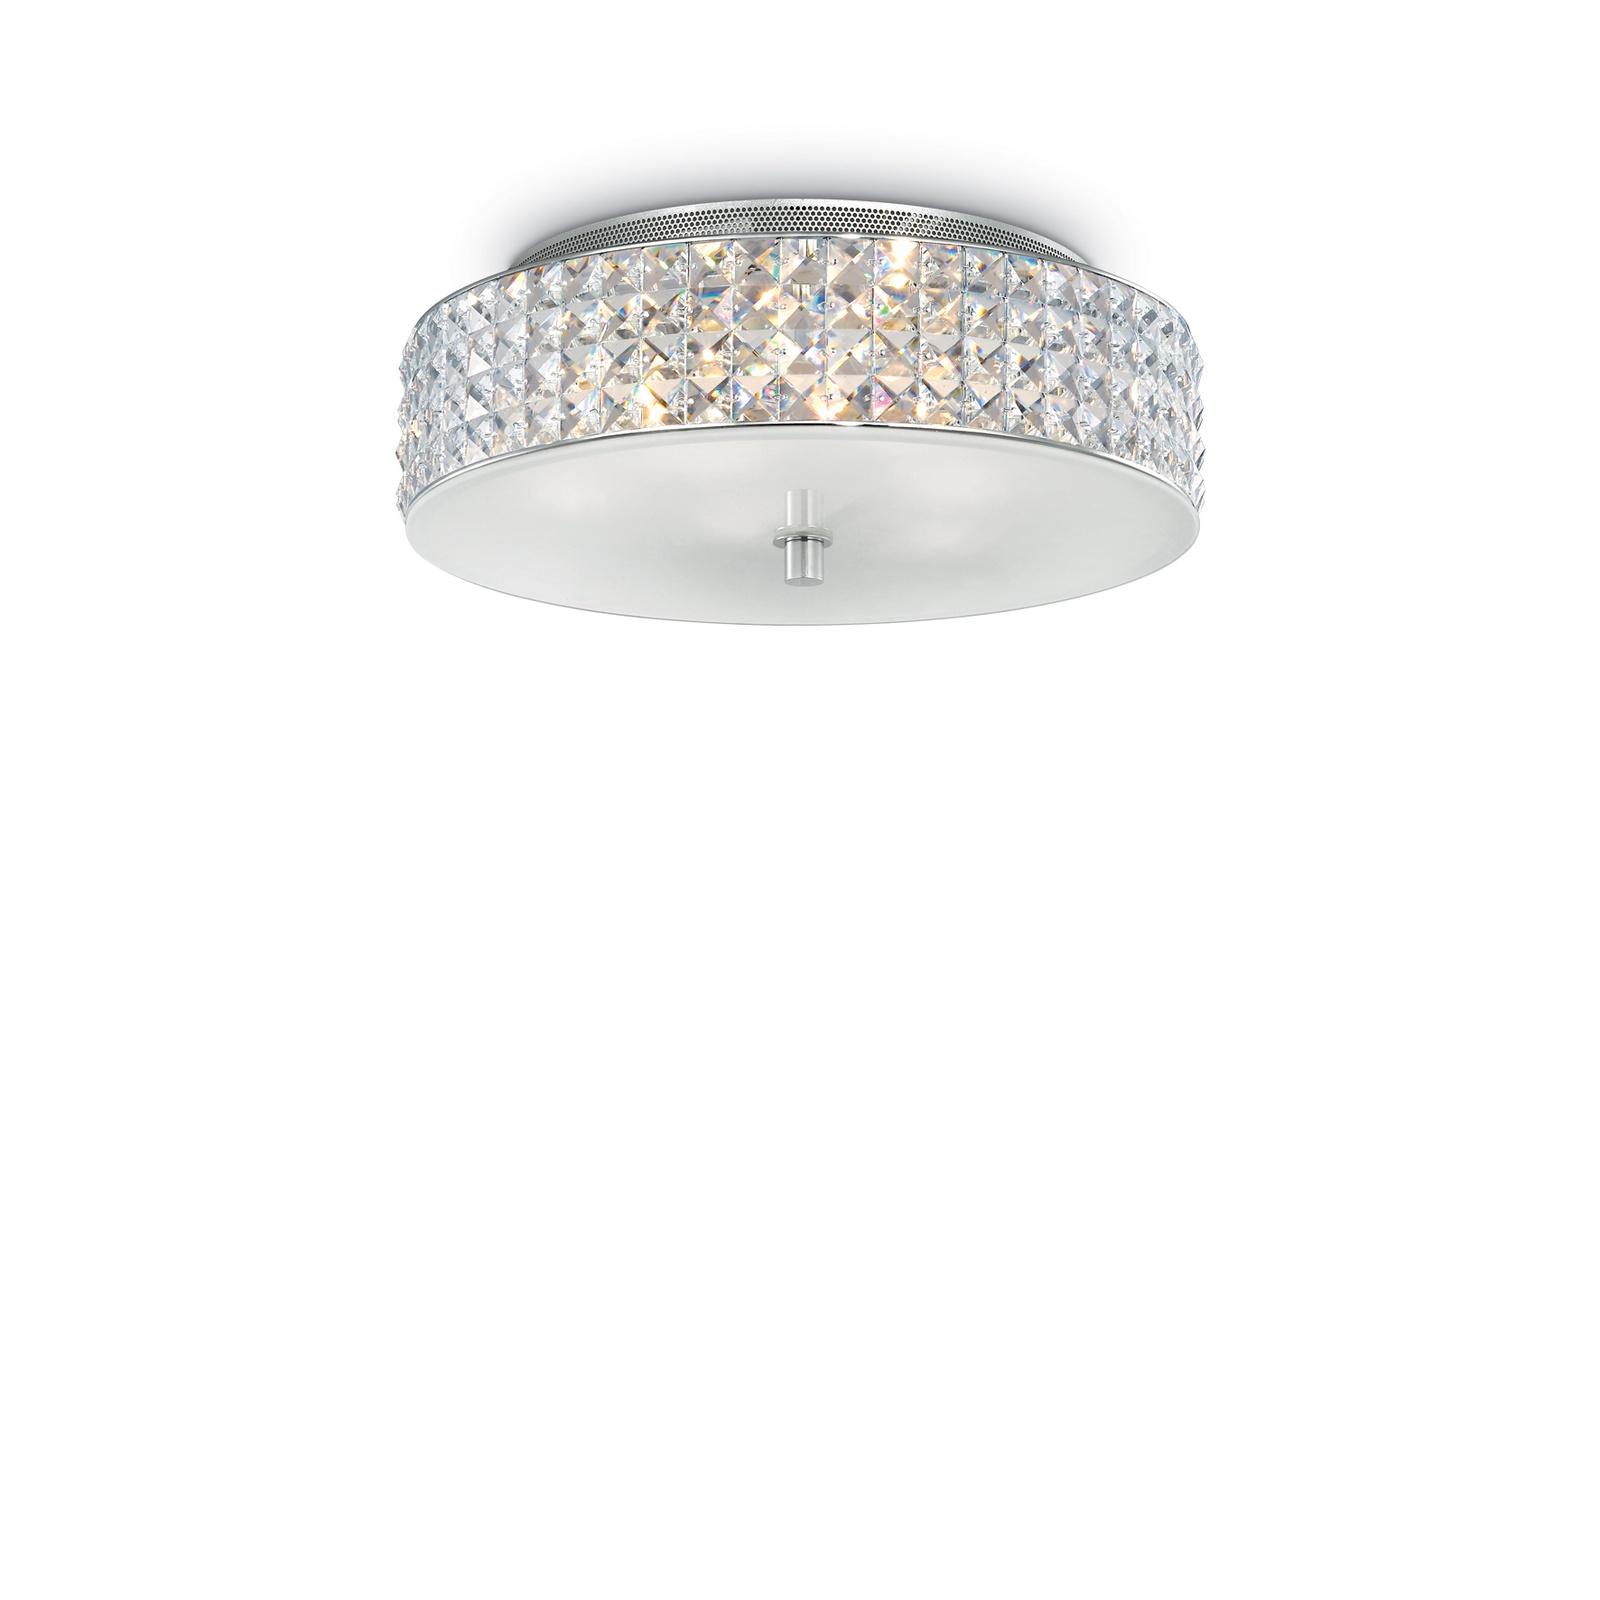 Фото - Потолочный светильник Ideal Lux PL6, G9, max 6 x 40W G9 Вт потолочный светильник ideal lux pl6 g9 max 6 x 40w g9 вт